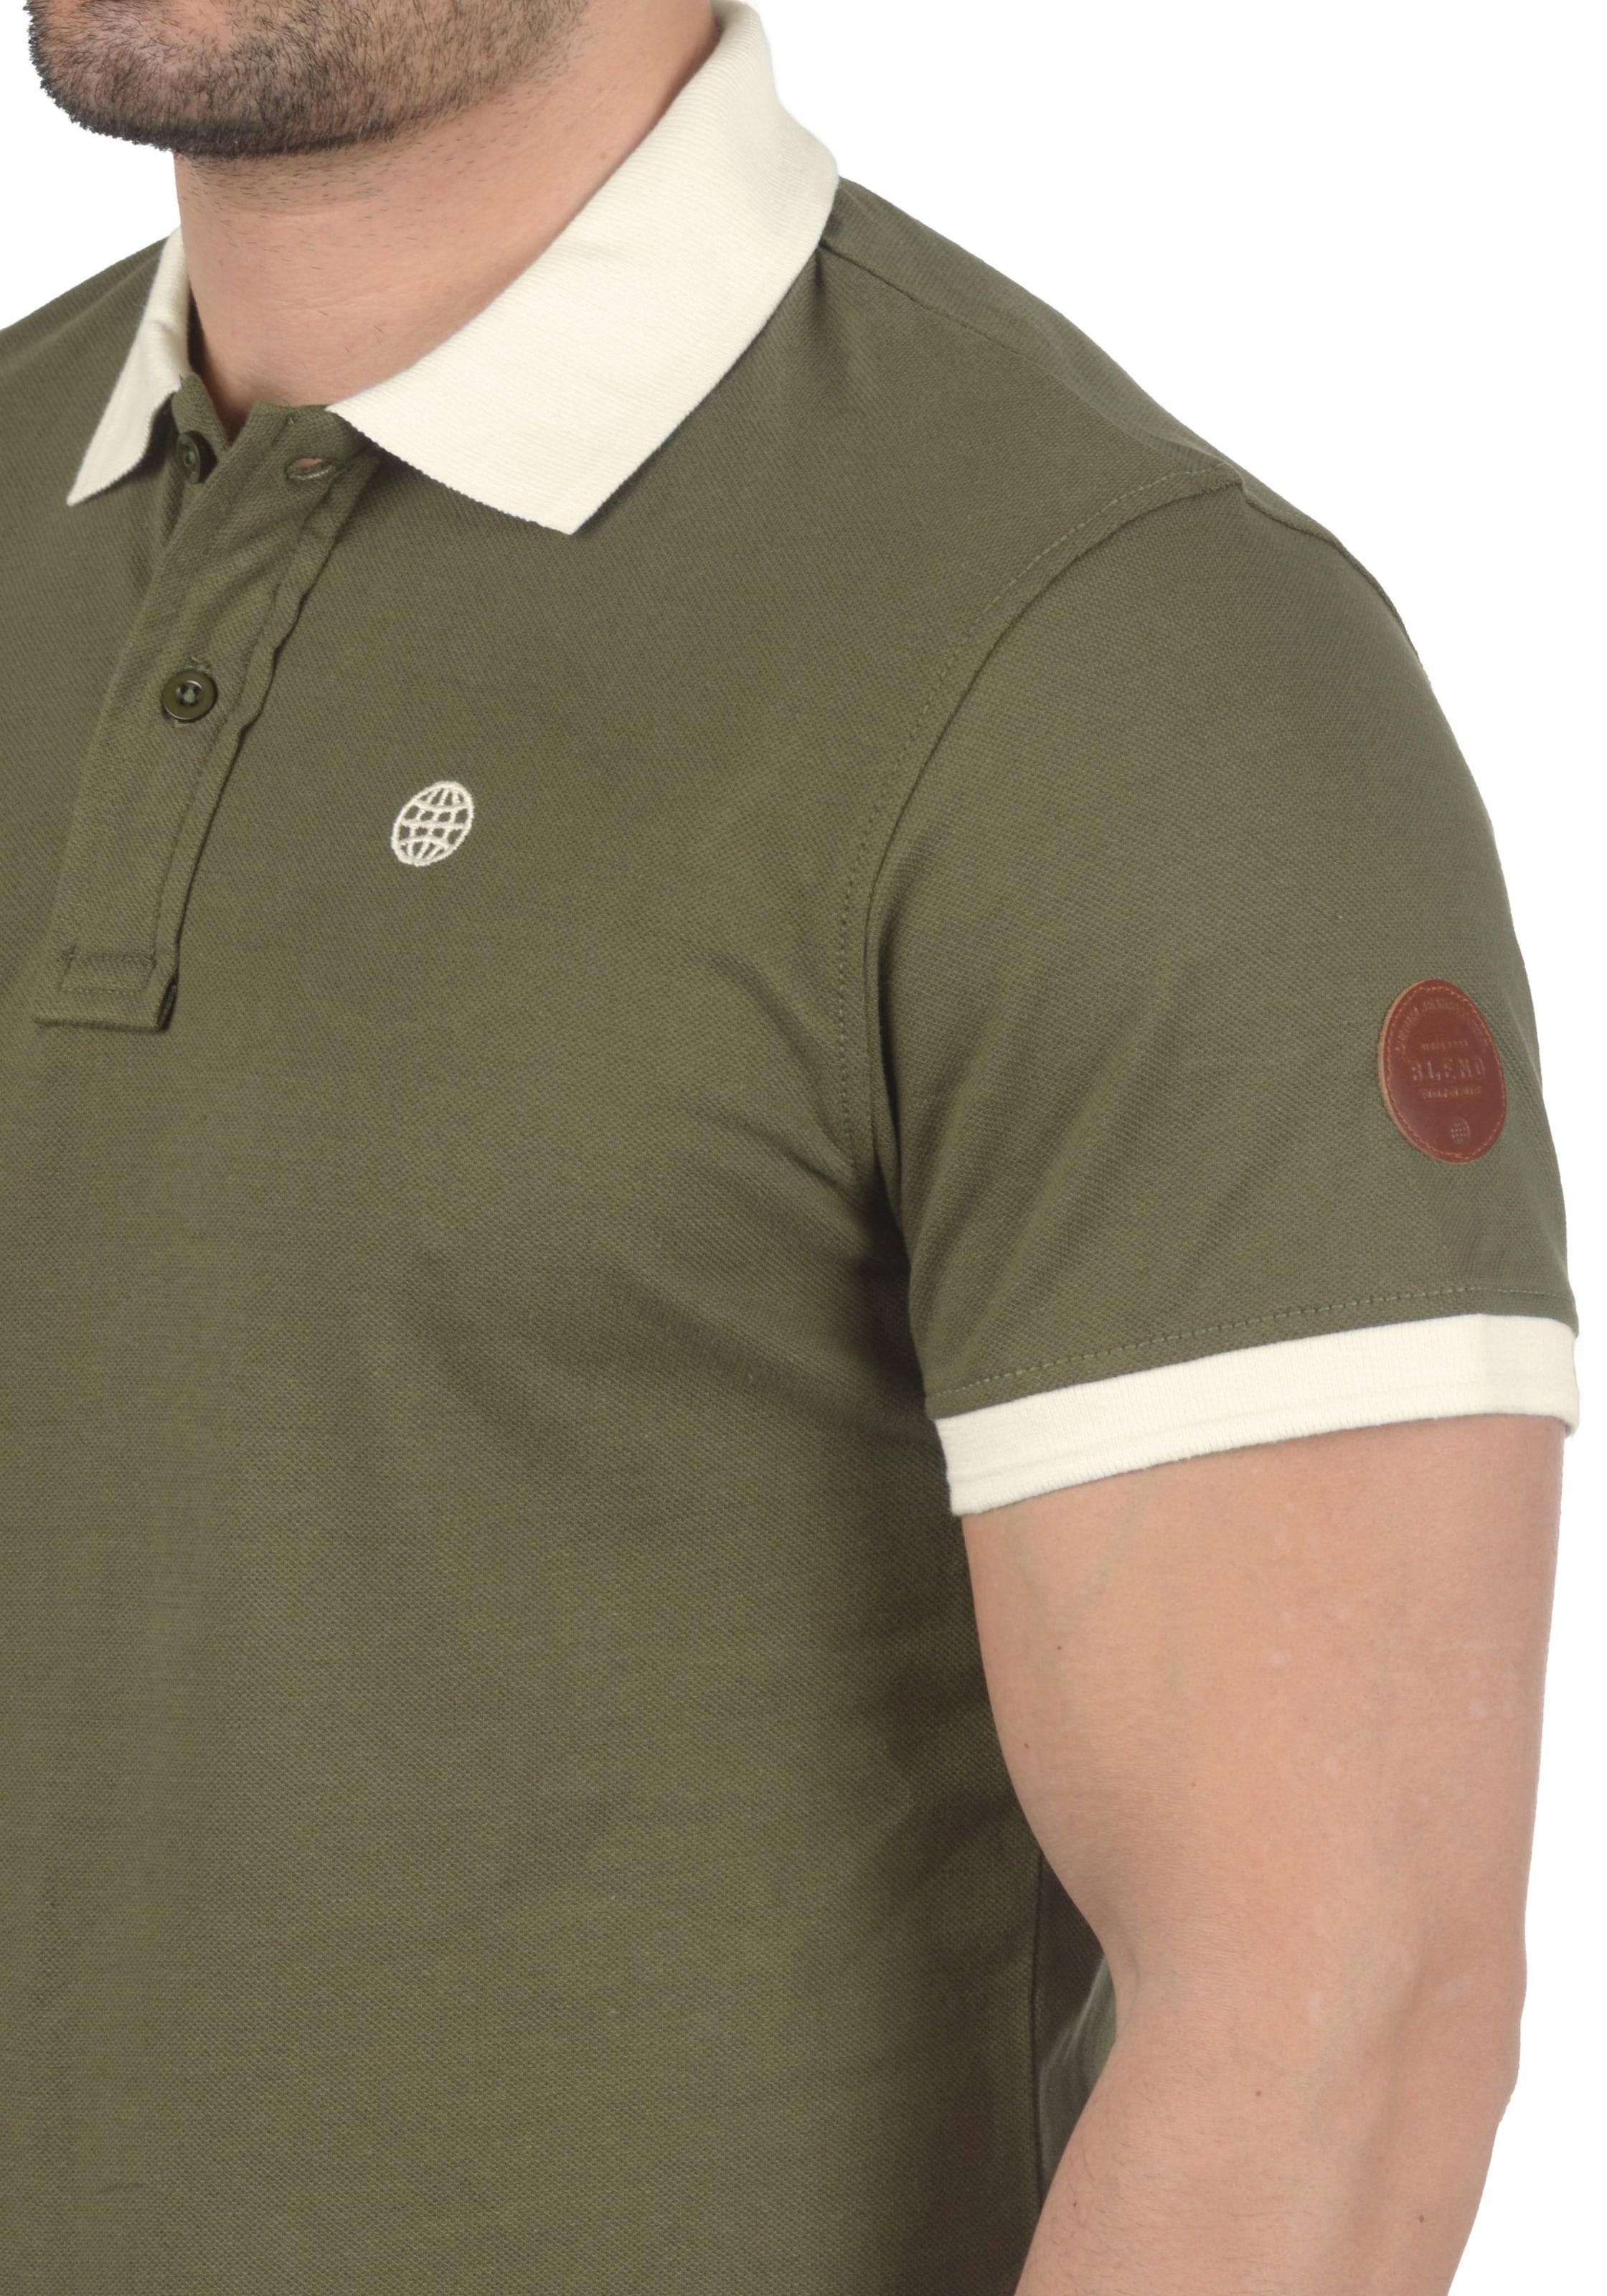 Grün Grün 'ralf' In Poloshirt In Blend 'ralf' Blend In Poloshirt 'ralf' Blend Poloshirt 76IYvgyfb